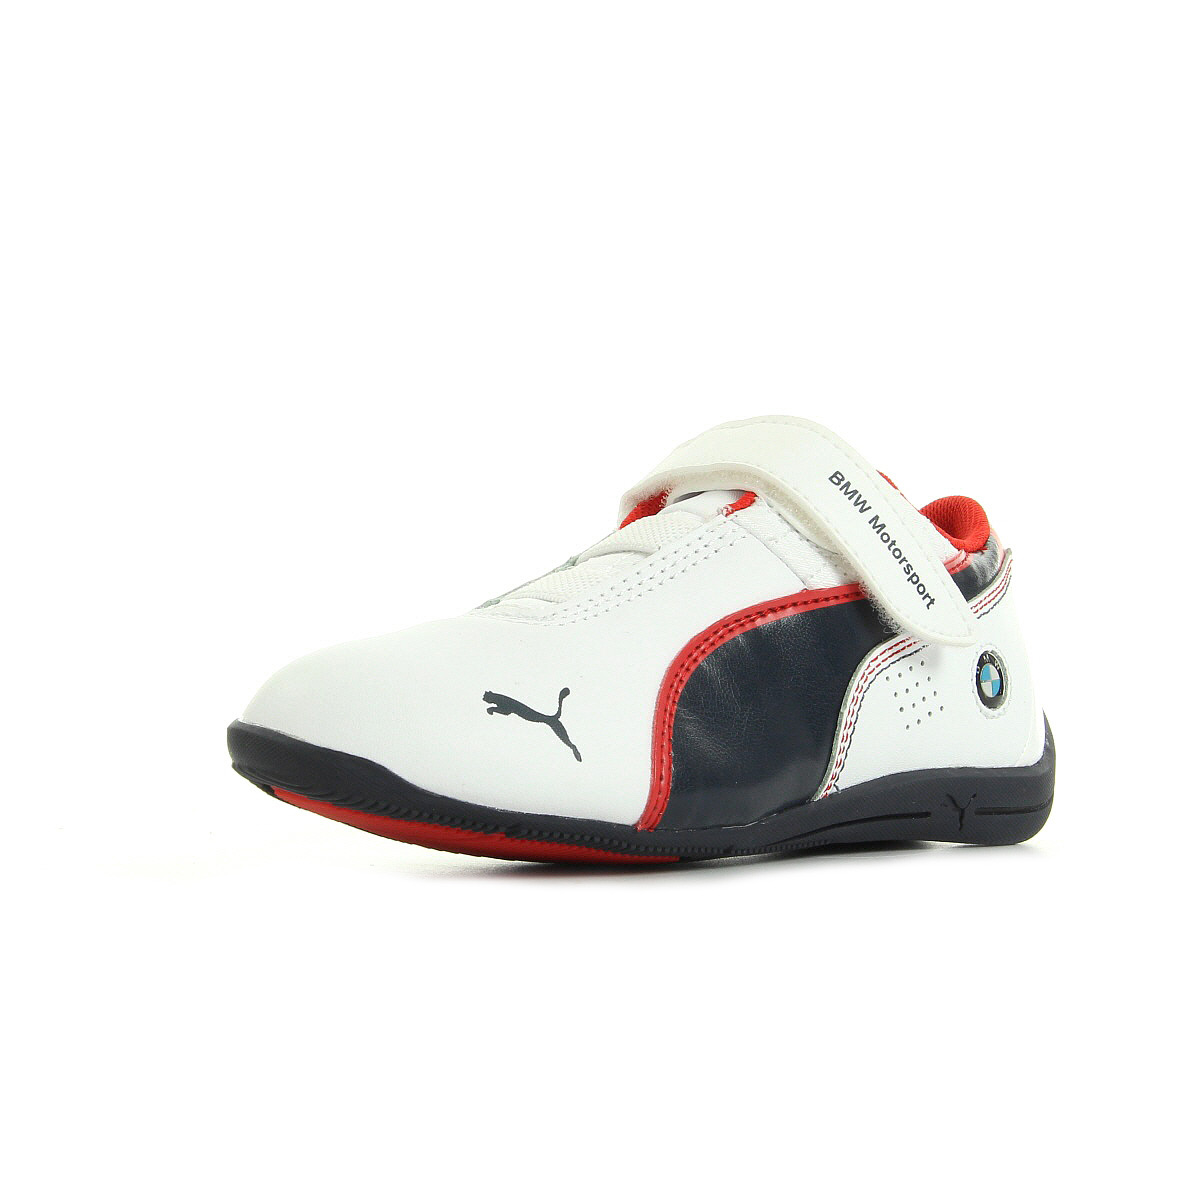 chaussures baskets puma gar on drift cat6 l bmw v kids taille blanc blanche ebay. Black Bedroom Furniture Sets. Home Design Ideas